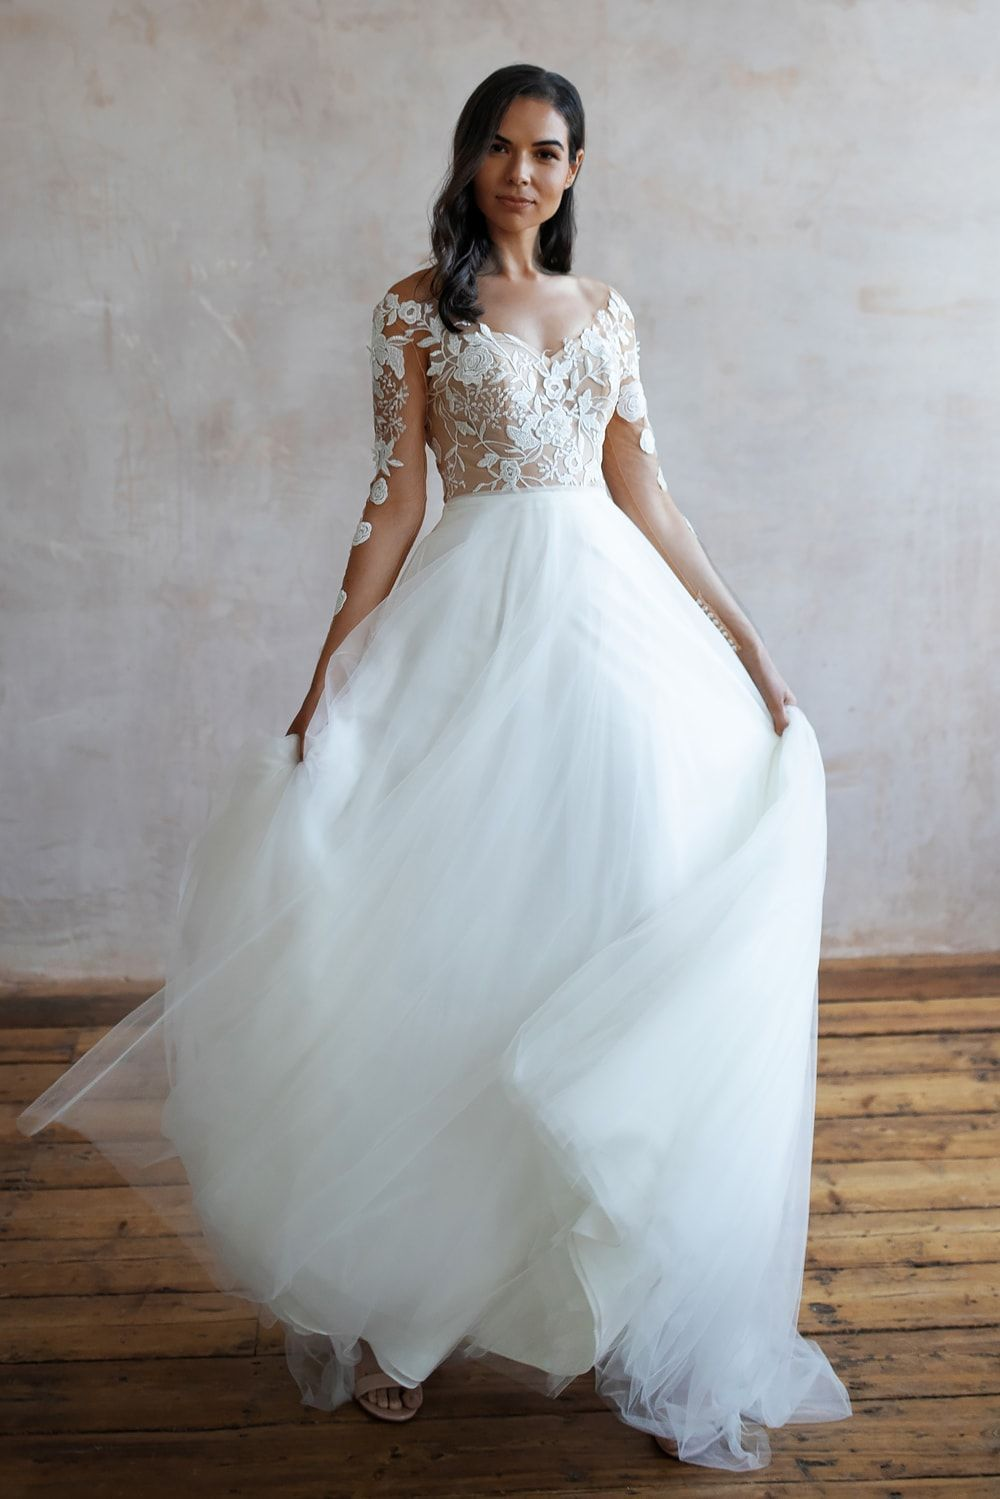 Wedding Dresses Lace Wedding Dresses Long Sleeve Boho Wedding Dresses Wedding Dress Beach Mermaid Wedding Dresses Alterna 7 1